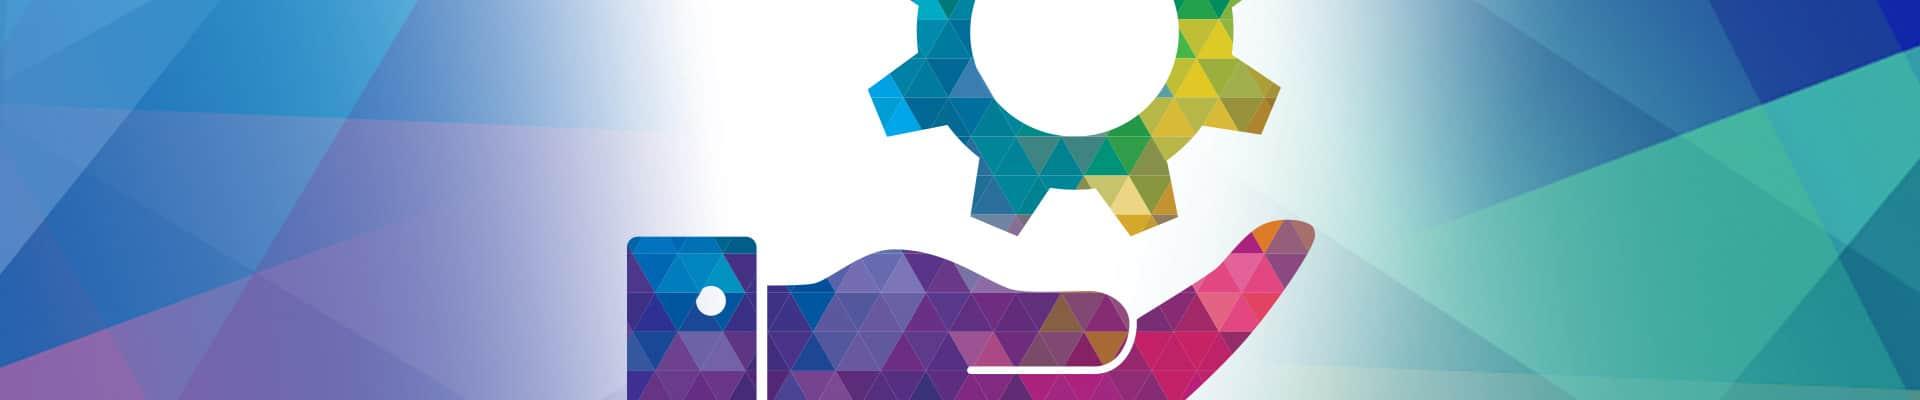 Kaleidoscope Marketing Services Header Icon